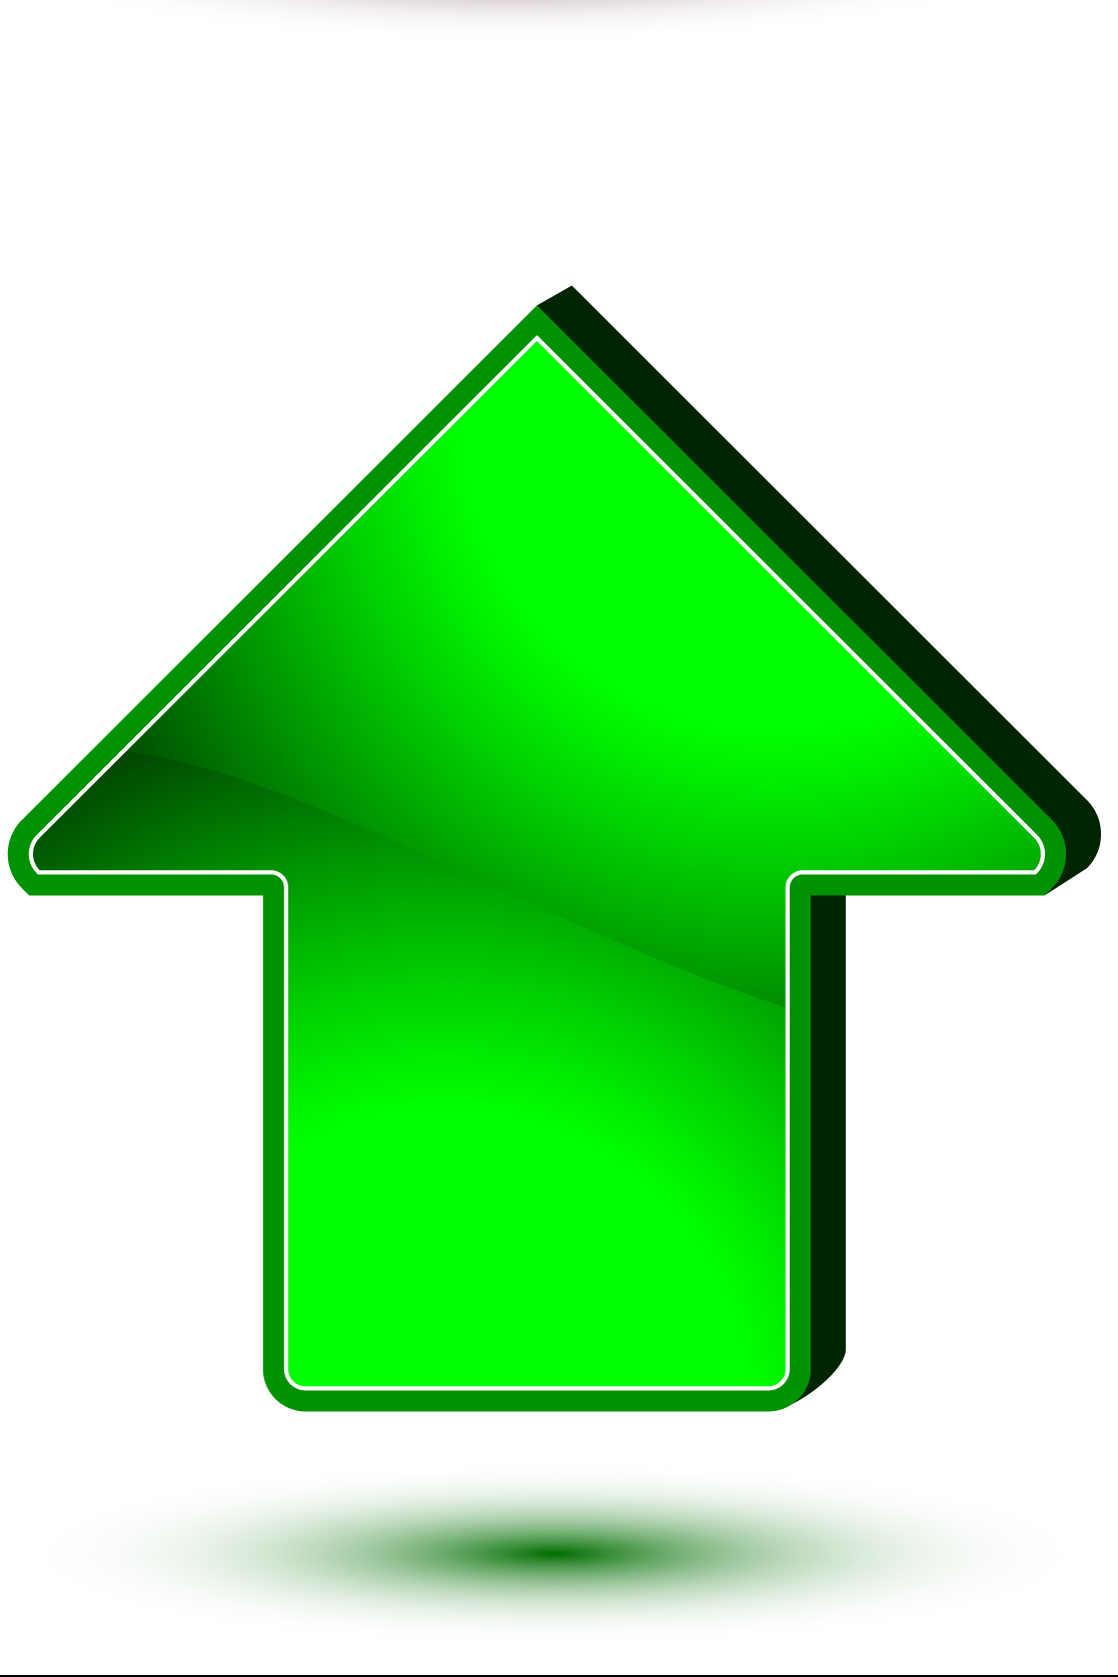 Green Arrow Clipart - Clipart Suggest